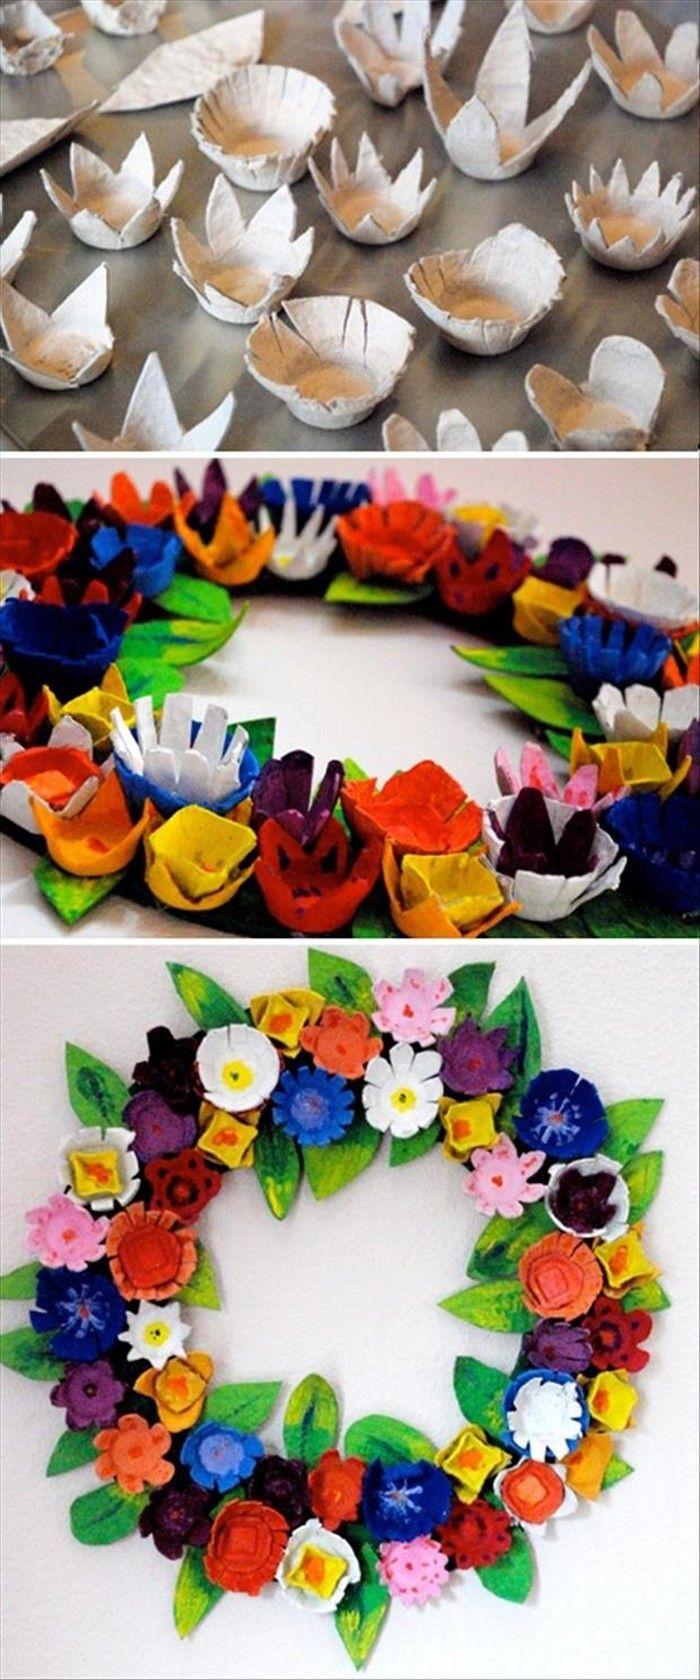 Basteln mit Eierkarton - Osterkranz aus Frühlingsblumen in einpaar einfachen Schritten #loisirscréatifs